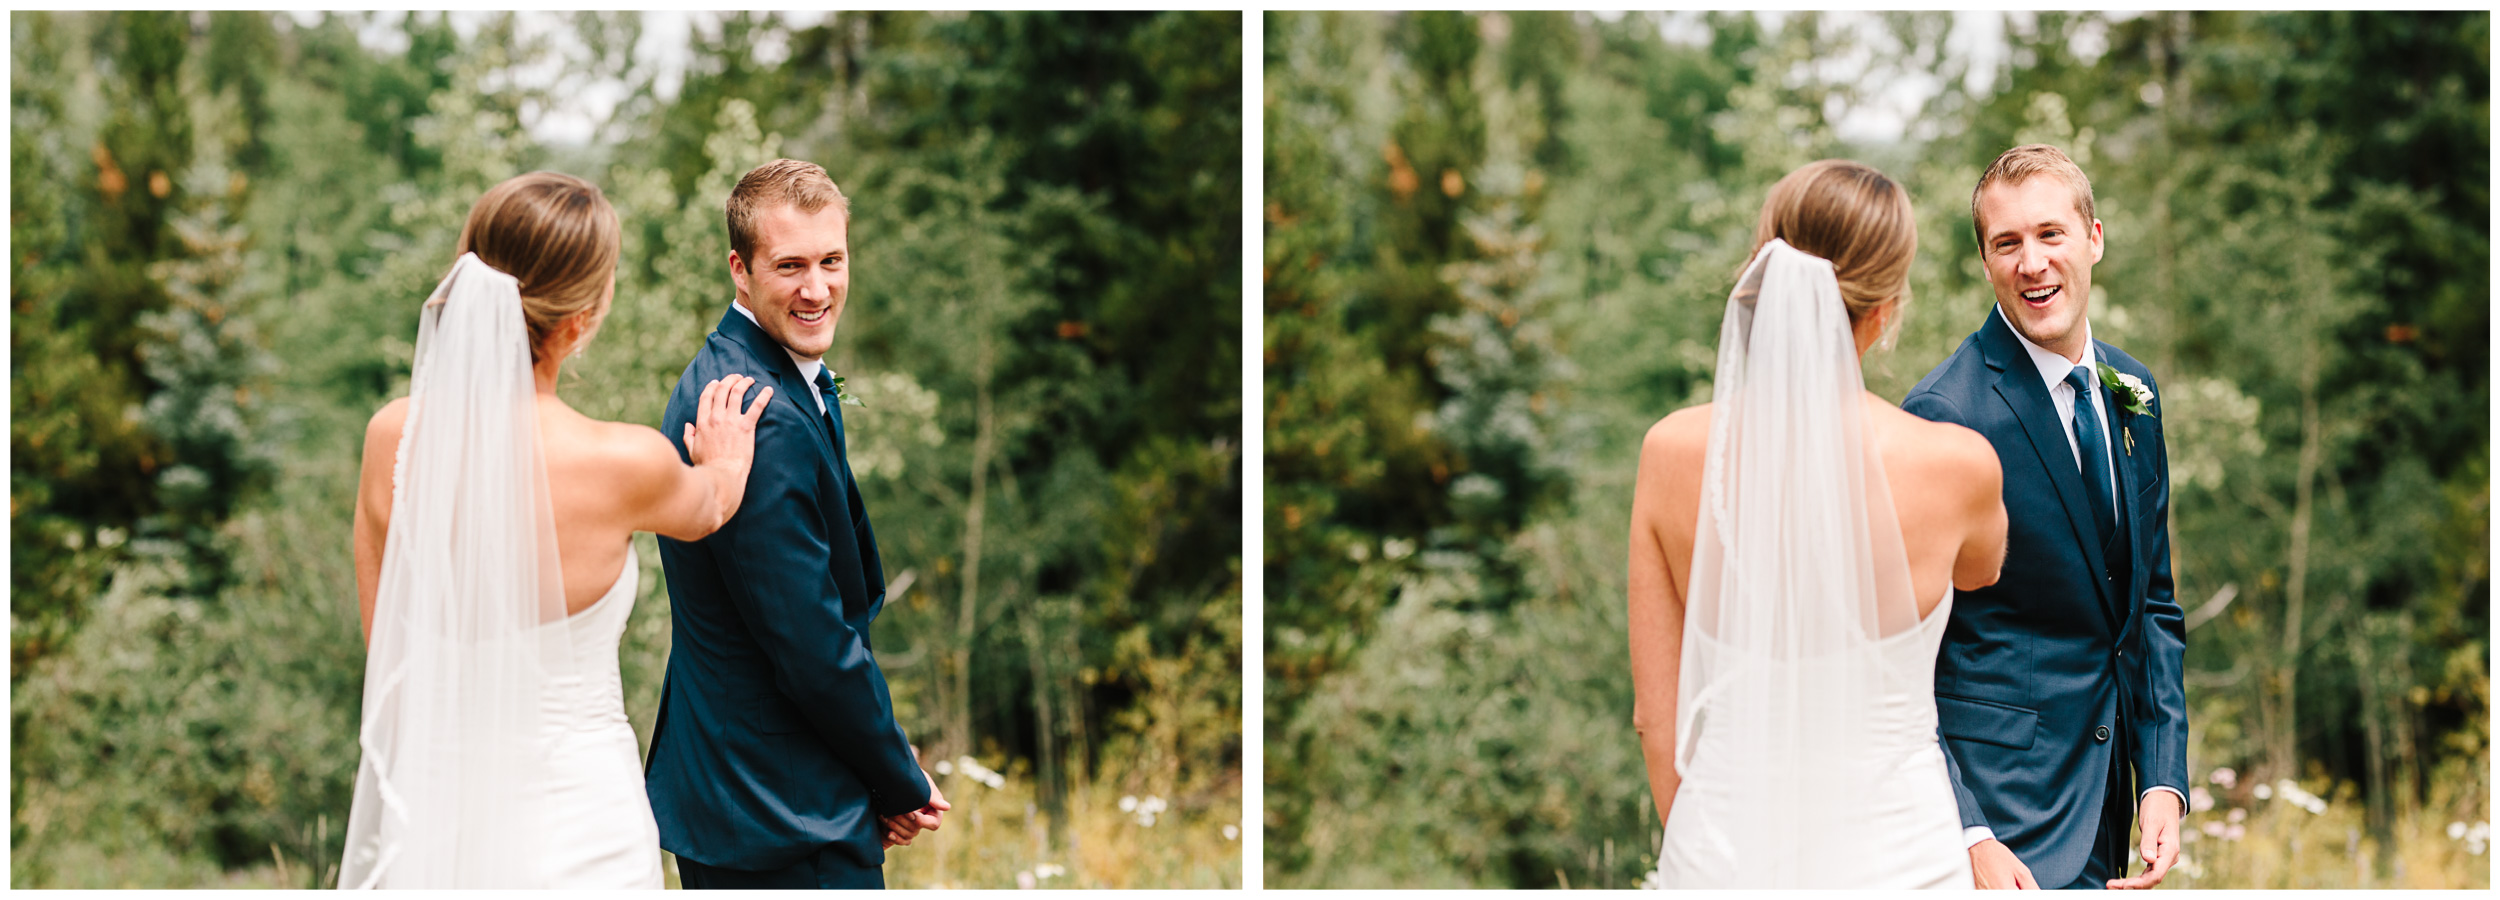 breckenridge_wedding_22.jpg